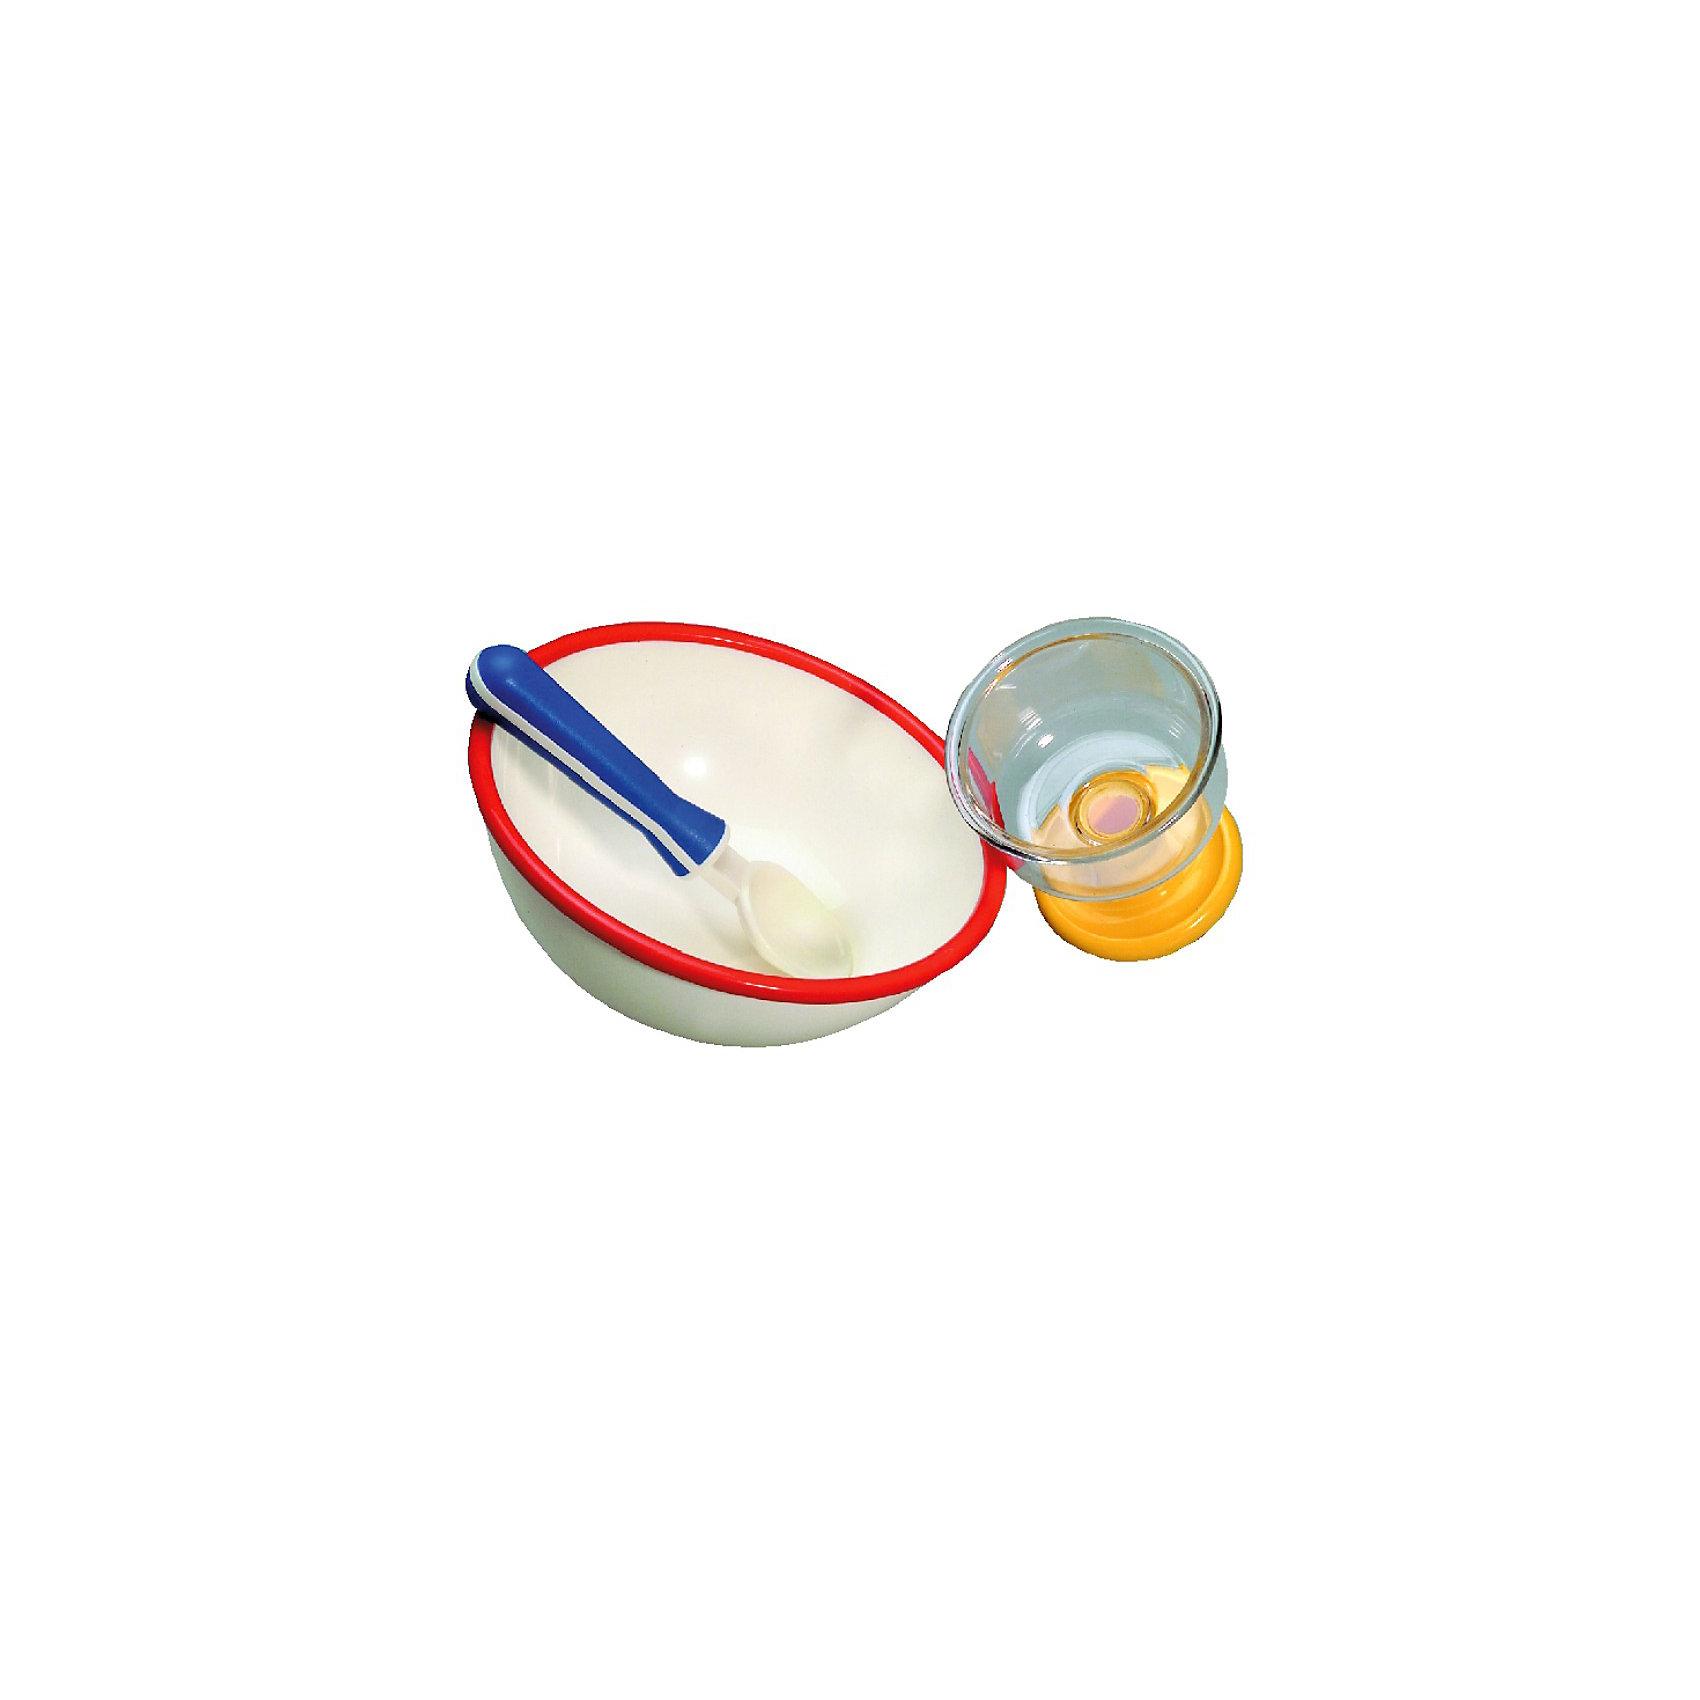 Spielstabil Набор для десерта 3 предмета